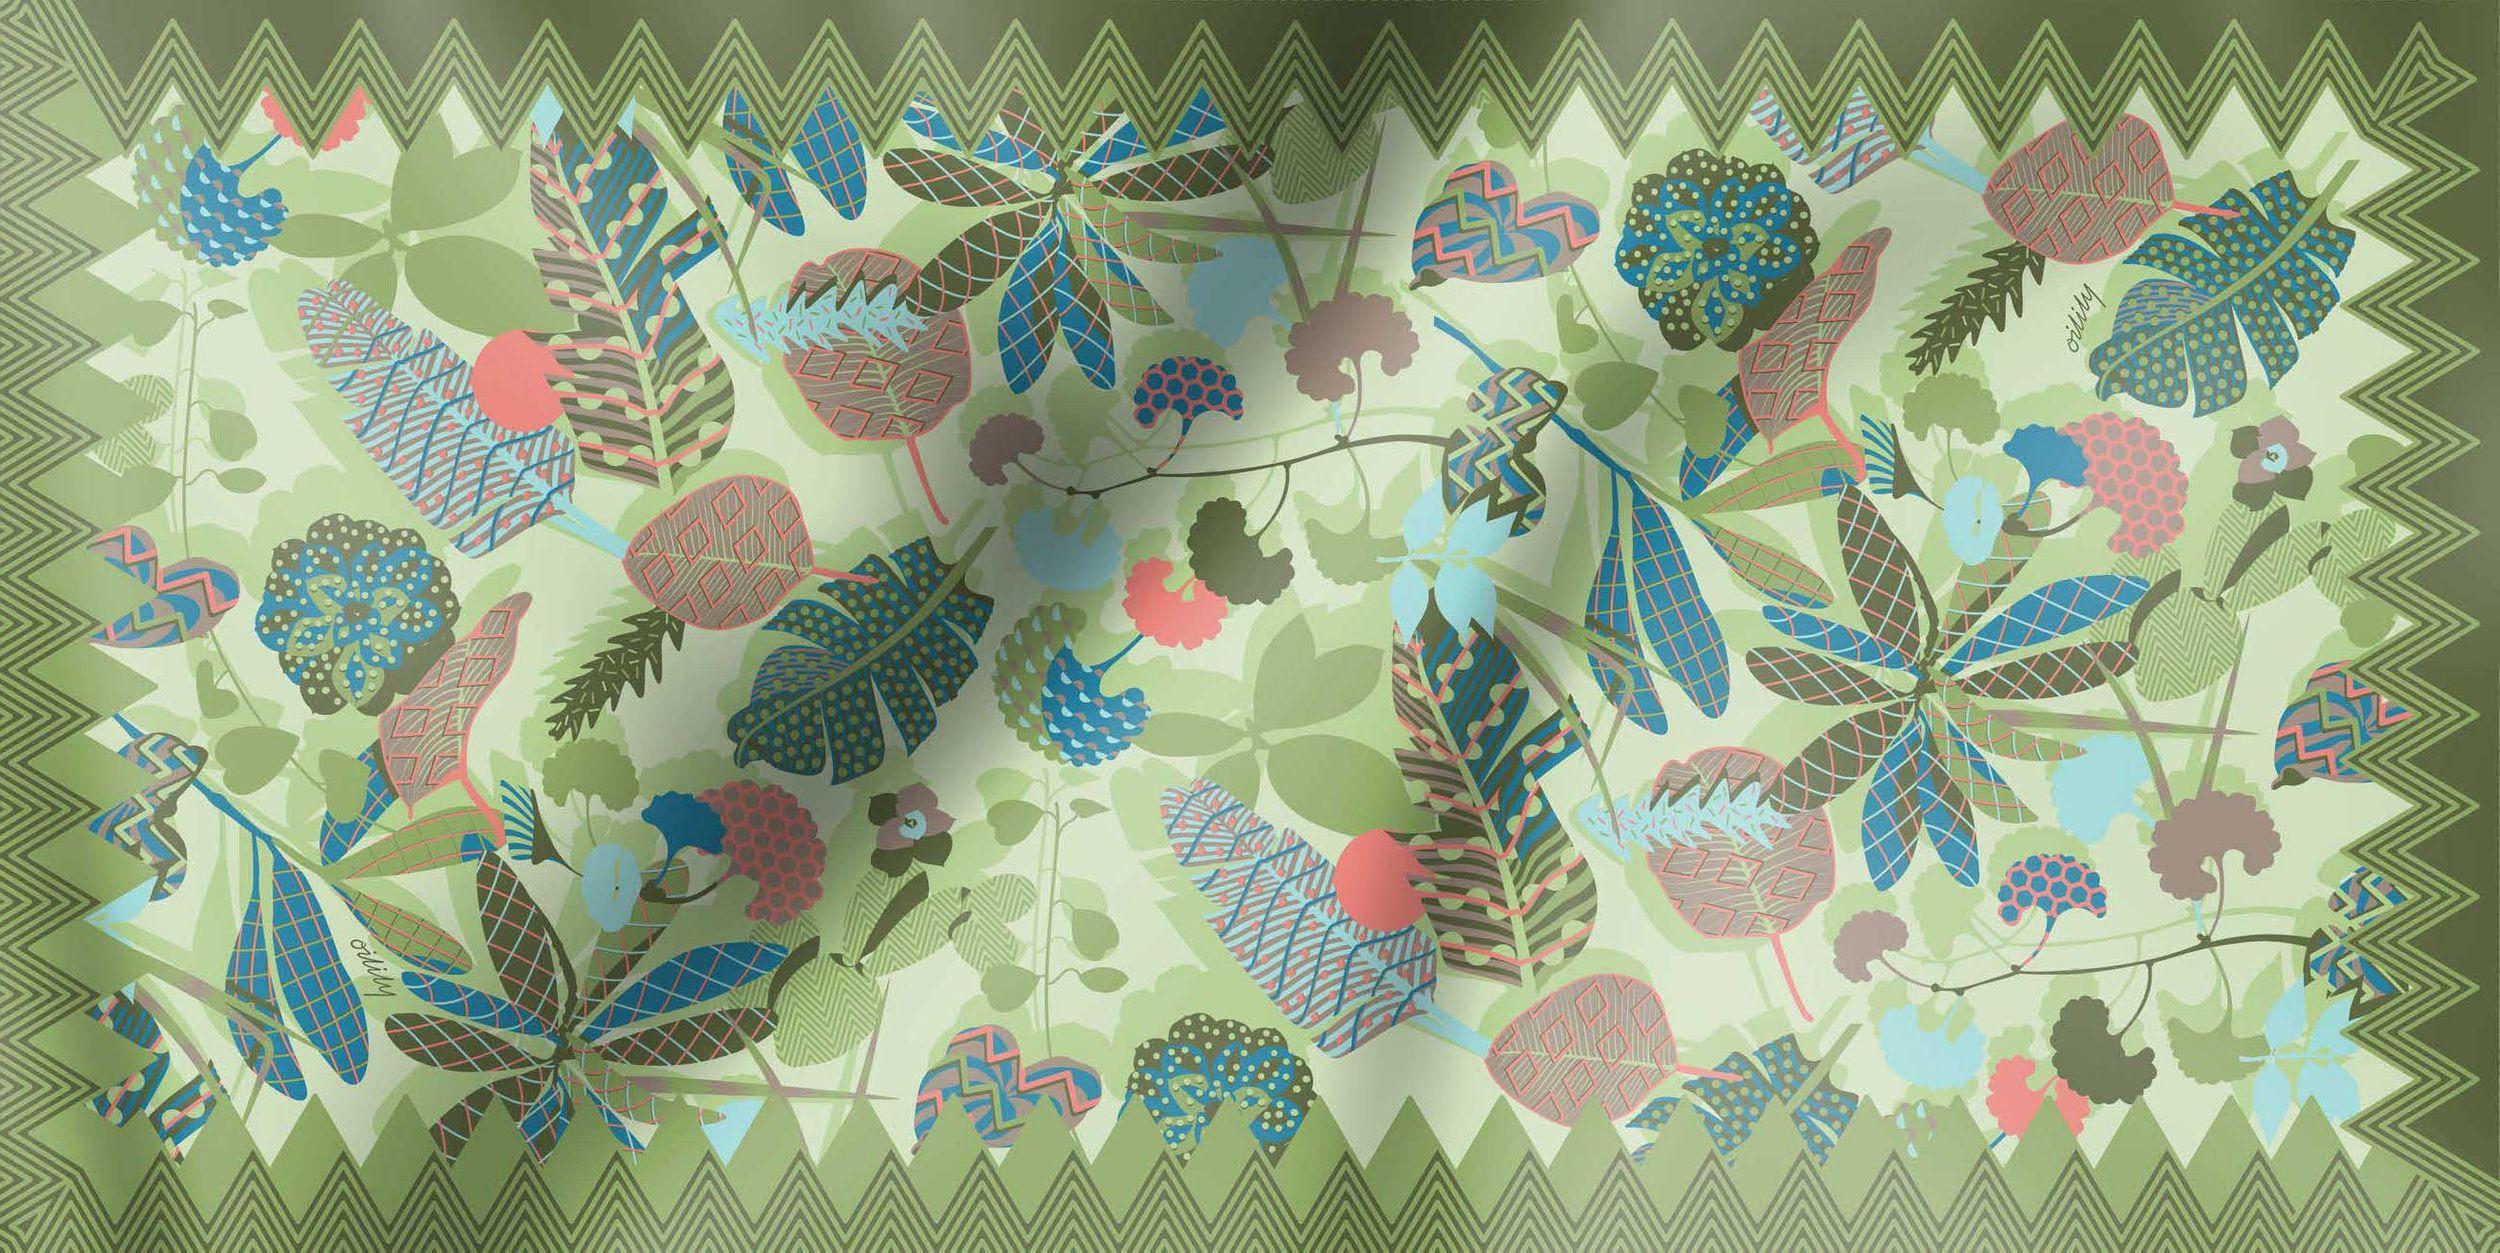 100/% Polyester Oilily Schal Tuch Botanic Pop Nori Green 100 x 200 cm